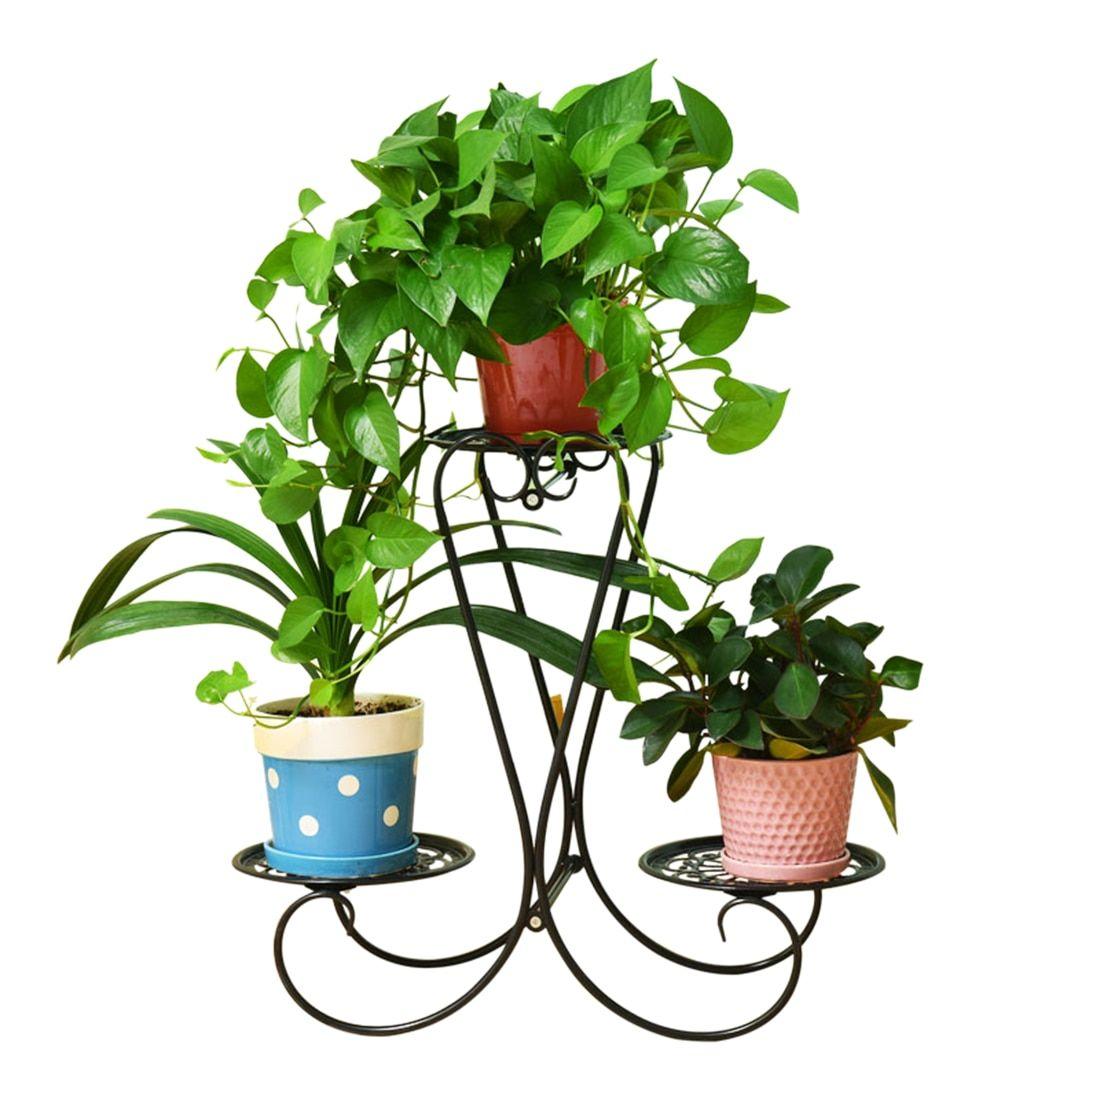 9 Tier Wrought Iron Plants Stand Metal Pot Planters Rack European Style  Plant Shelf Garden Decor